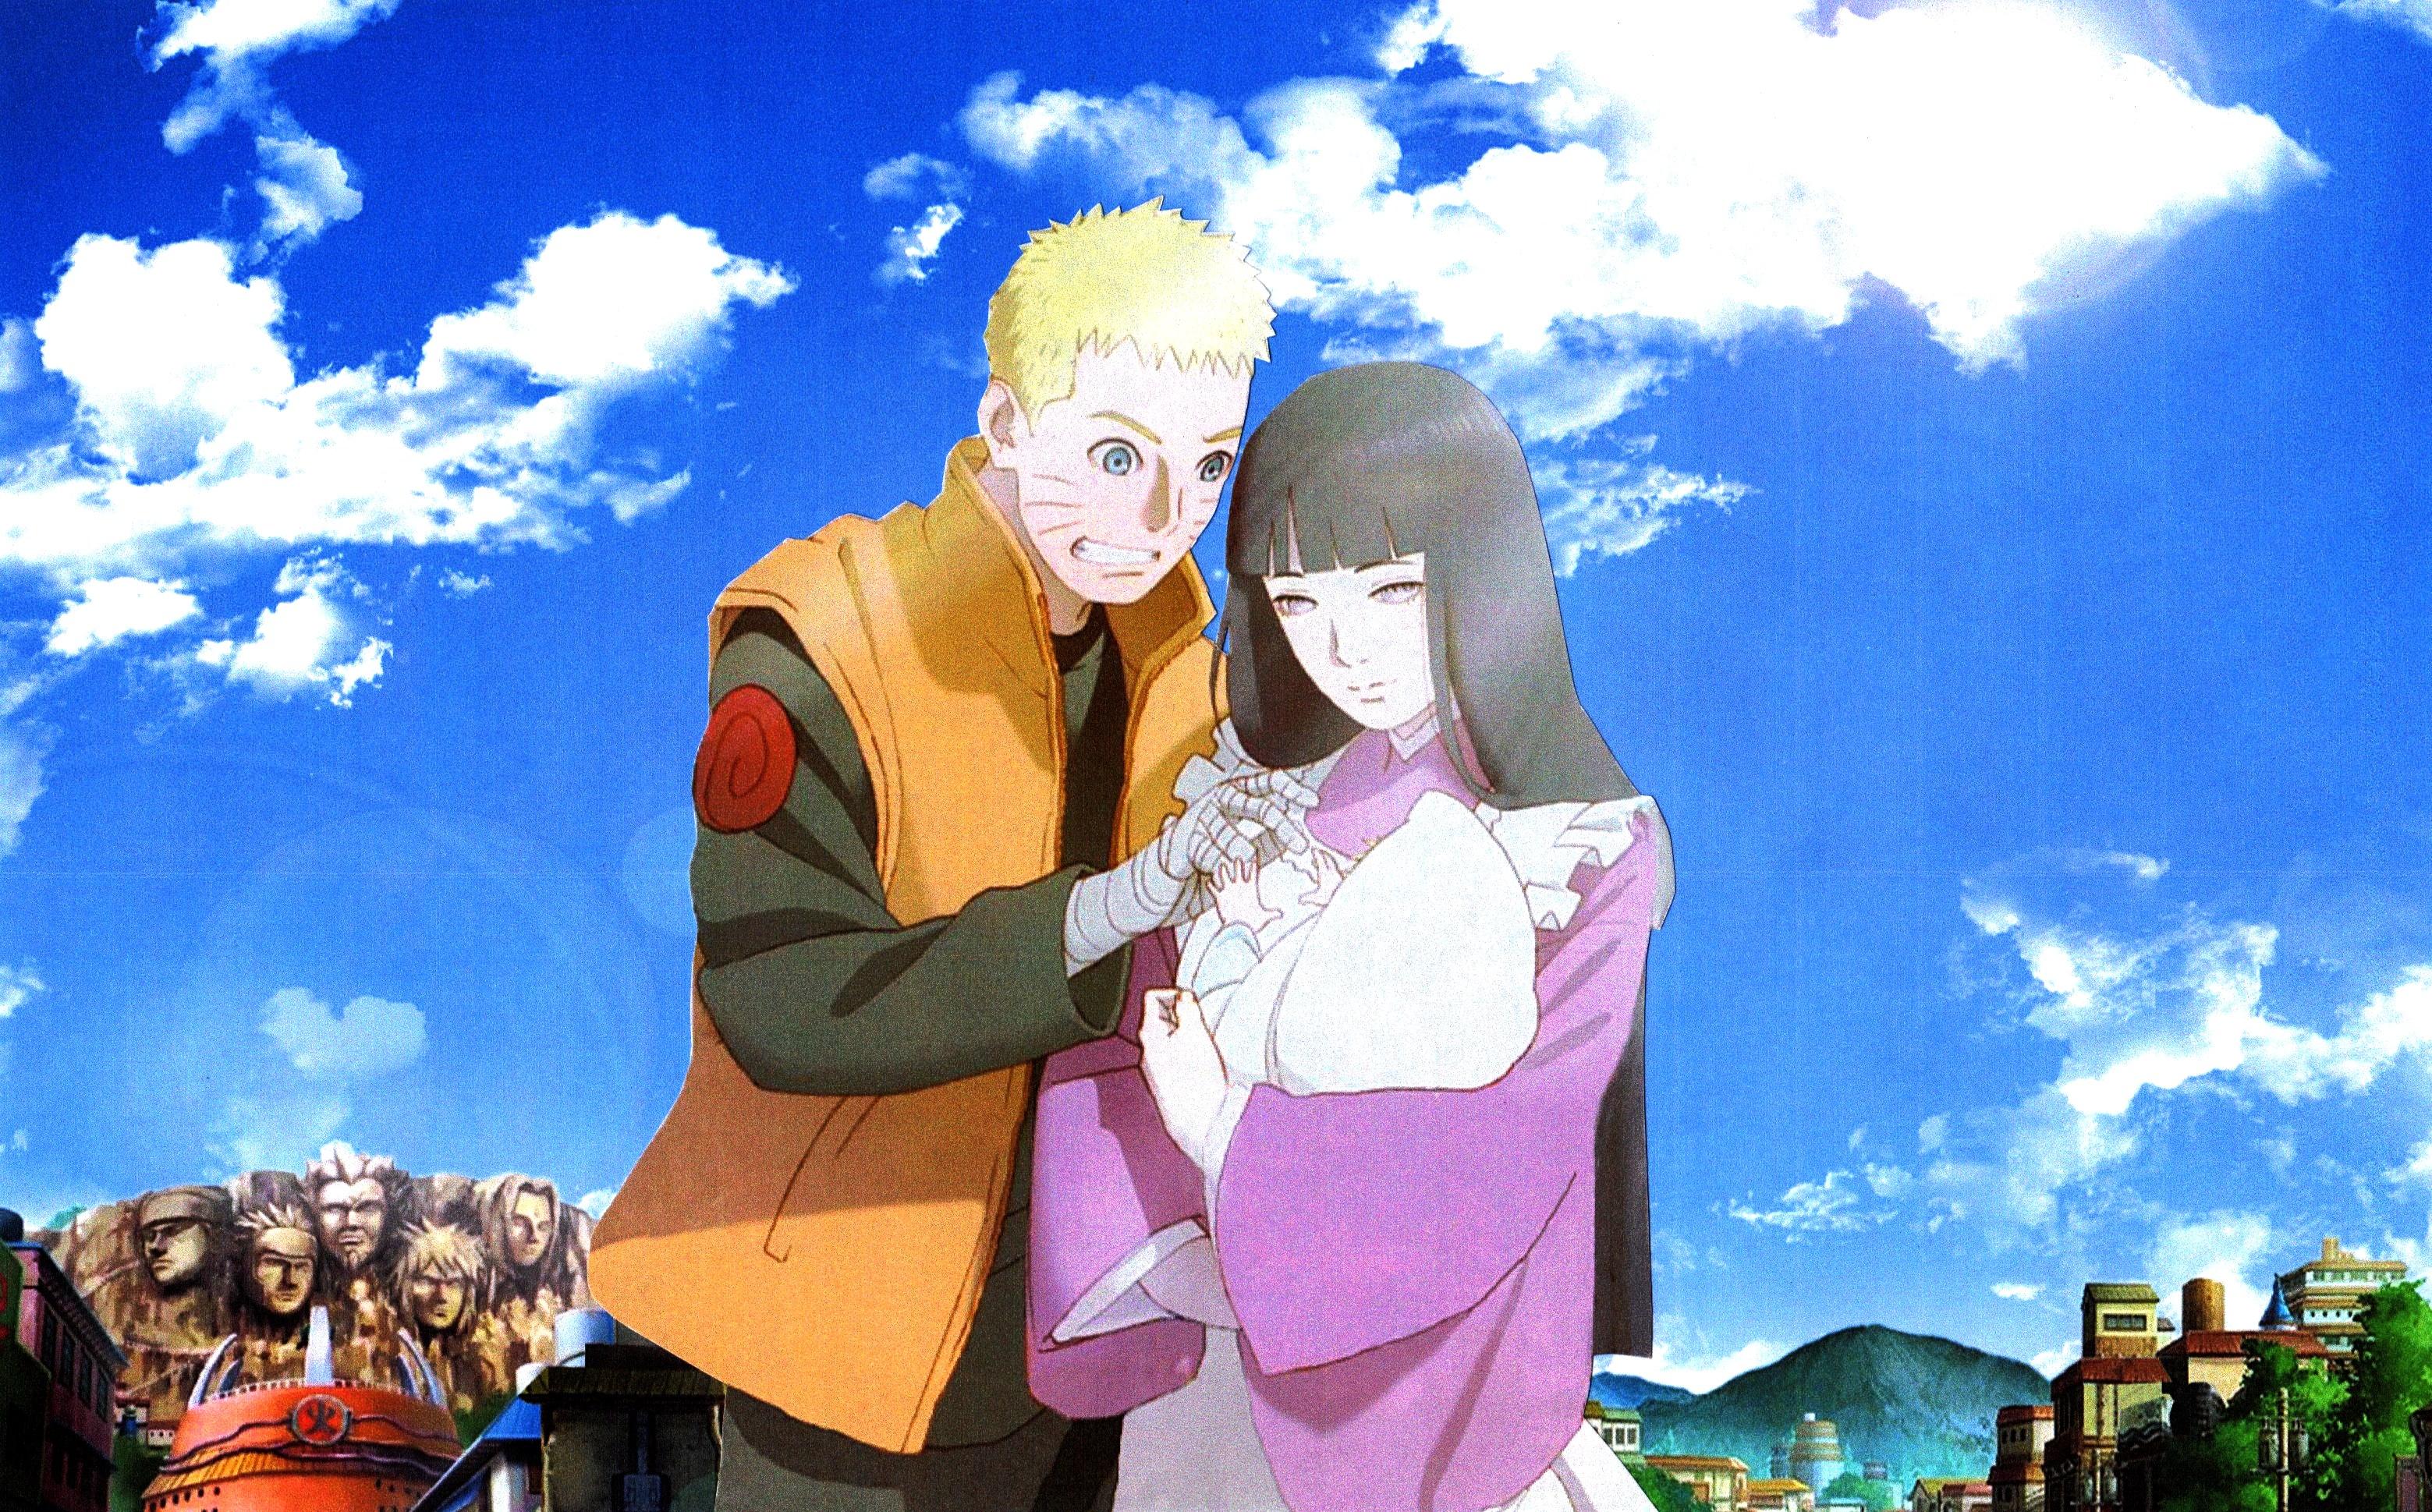 Must see Wallpaper Naruto Boruto - naruto_hinata_boruto_wallpaper_4_by_weissdrum-d8a65aw  You Should Have_201210.jpg